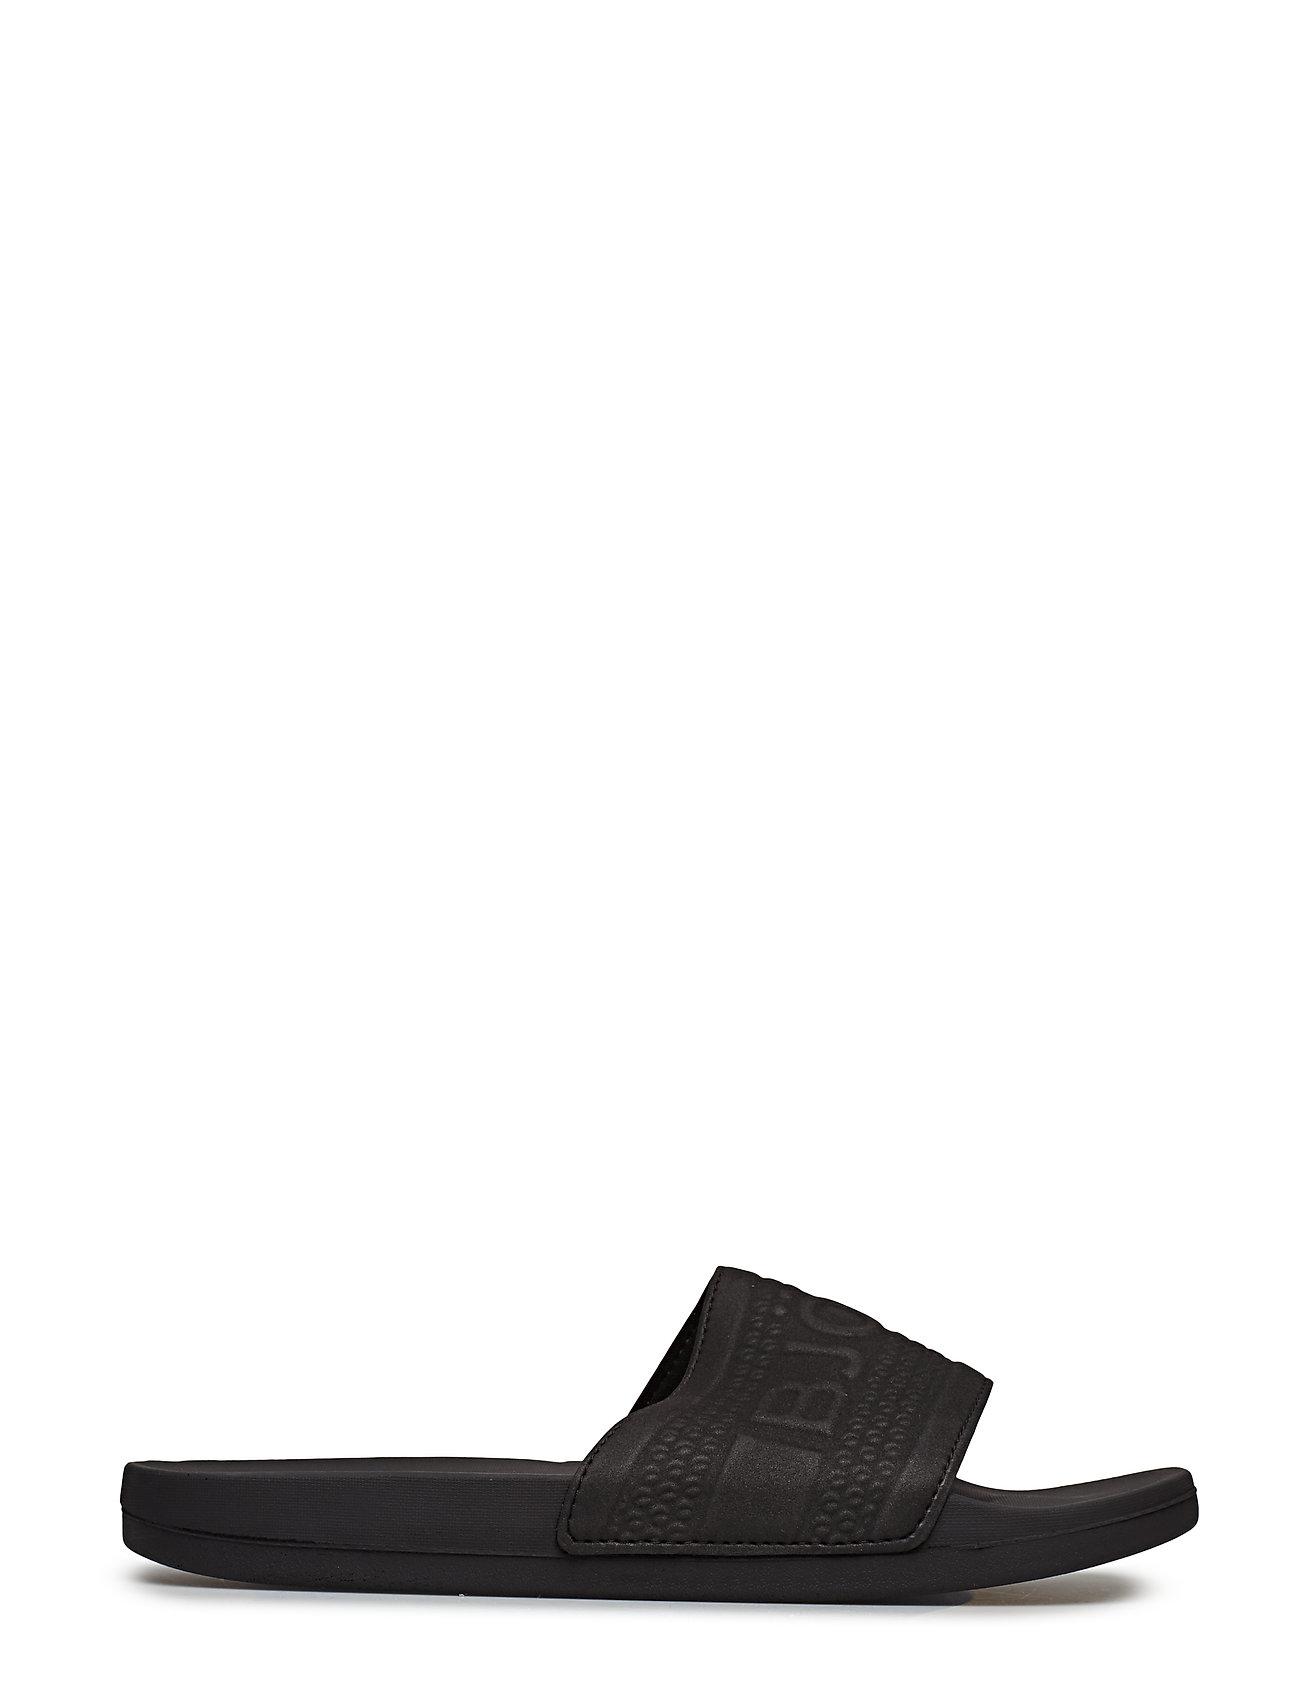 Romeo M Shoes Summer Shoes Pool Sliders Sort Björn Borg